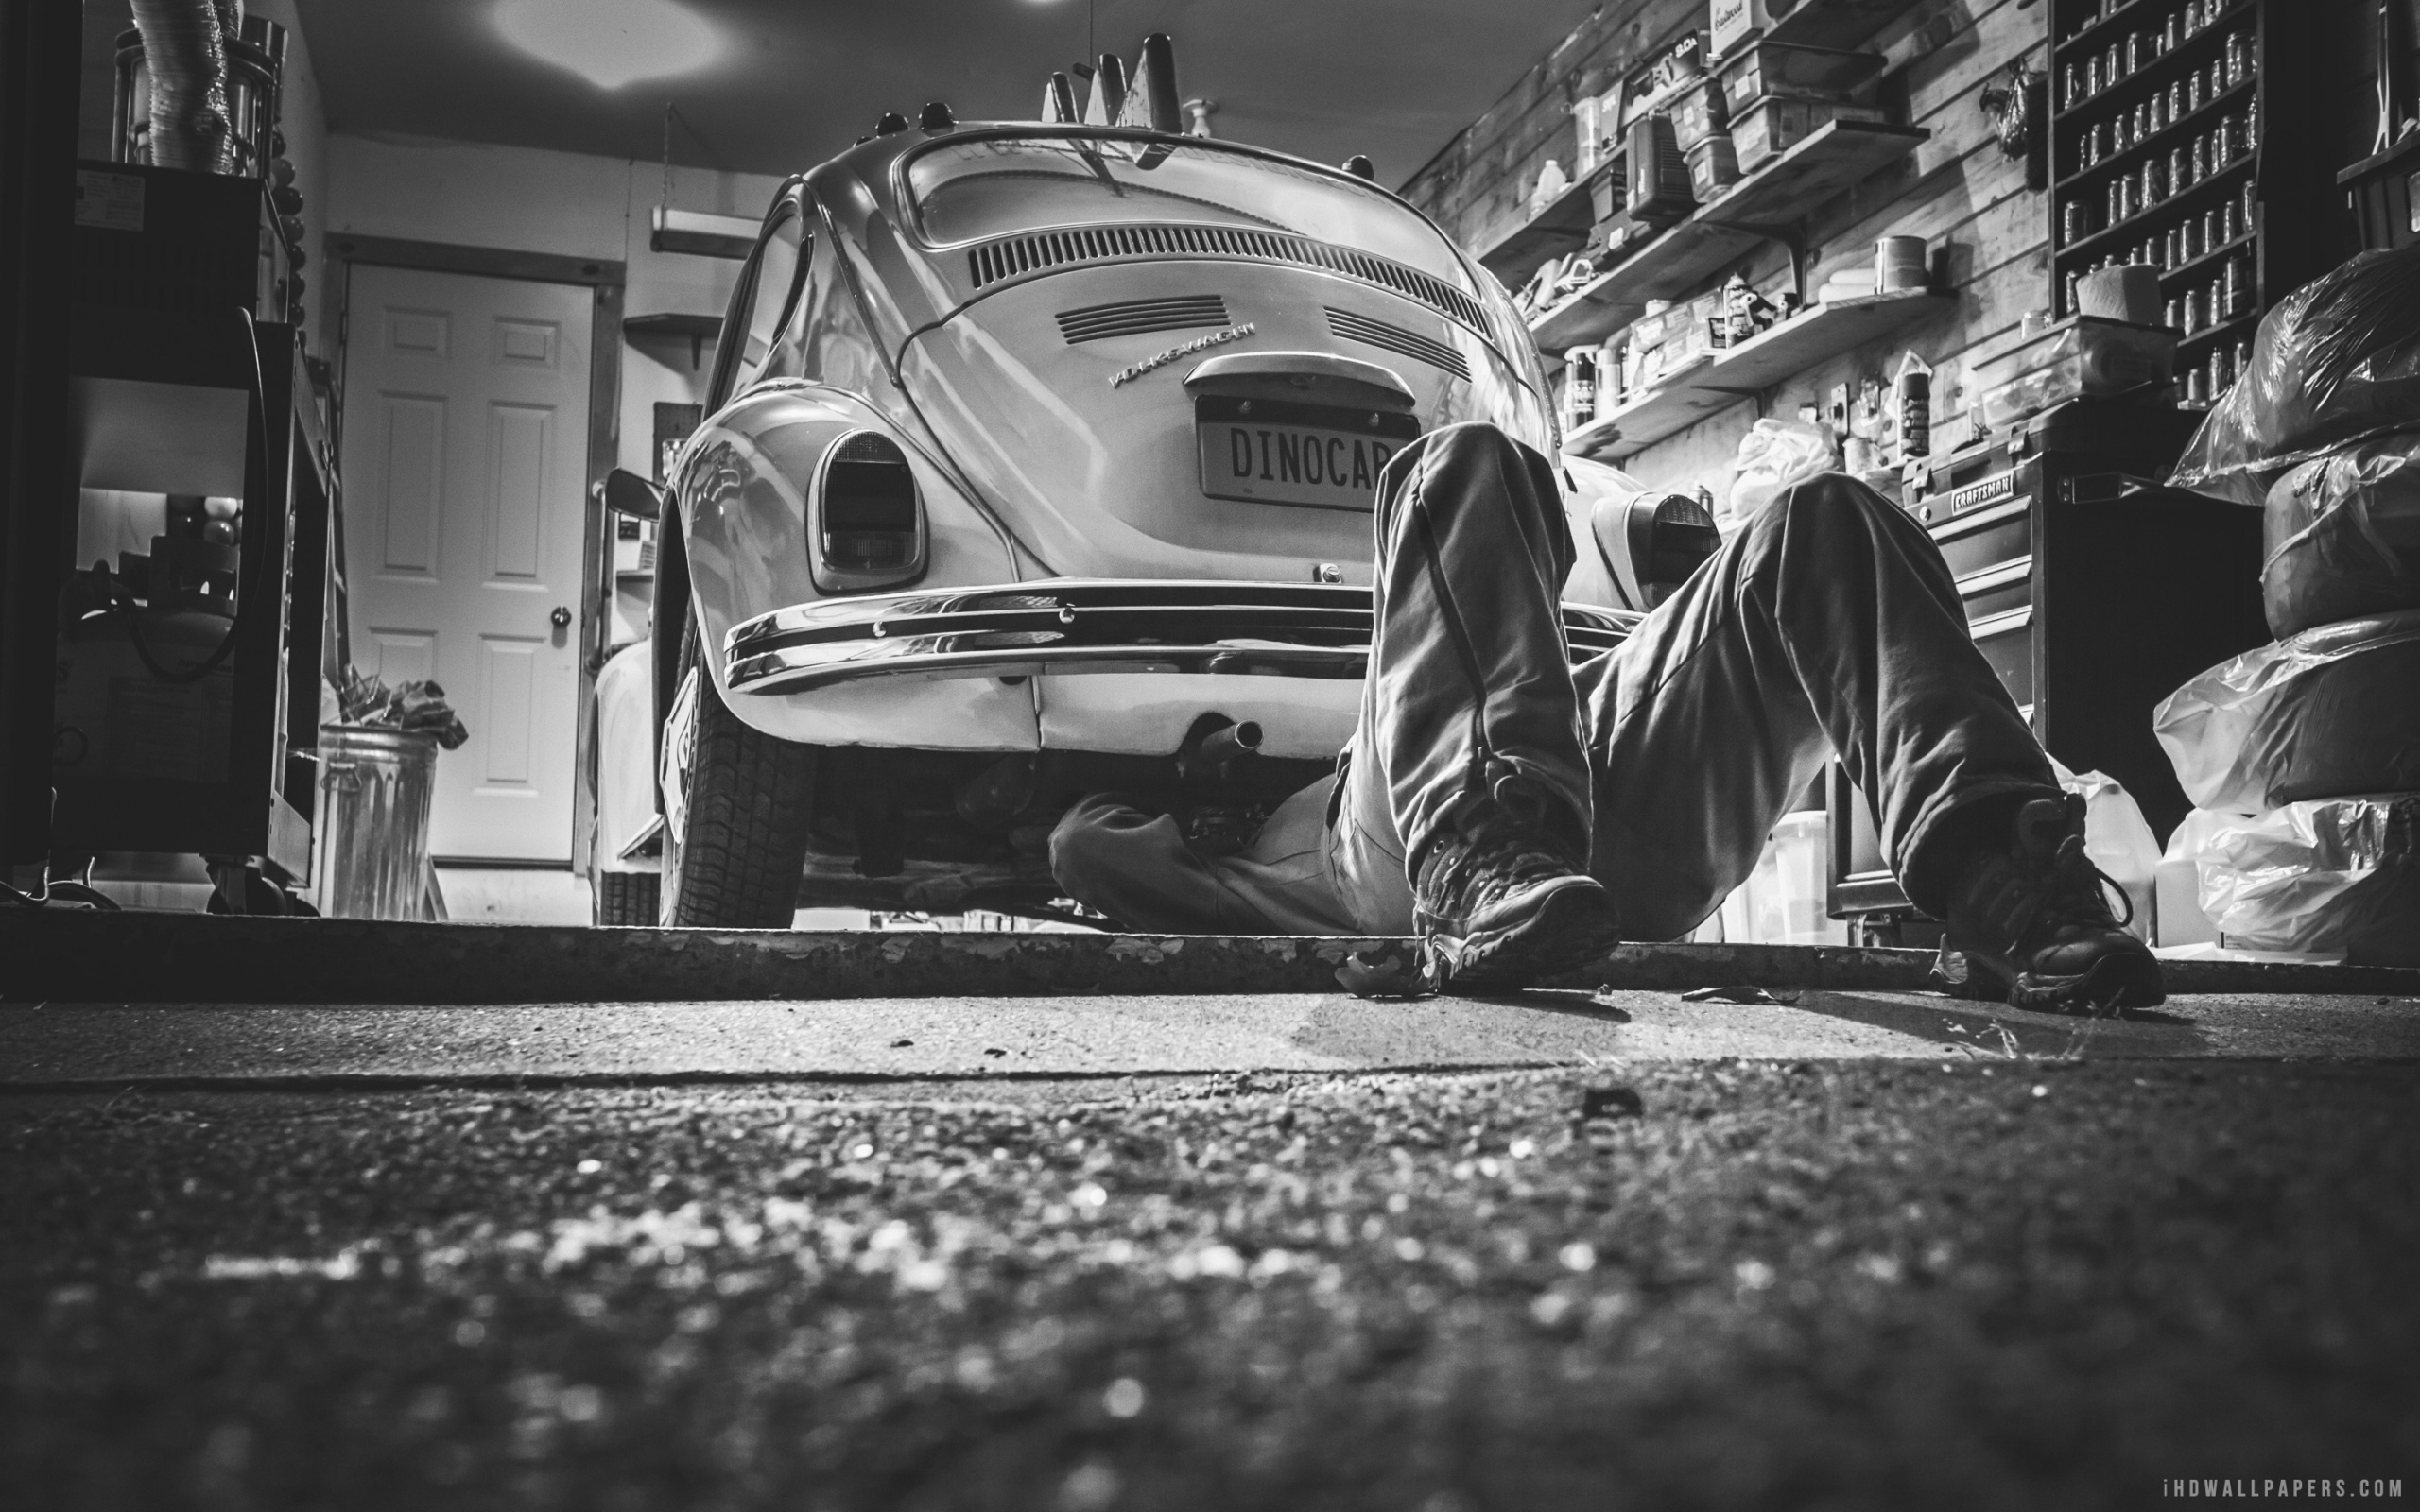 68424831-mechanic-wallpapers